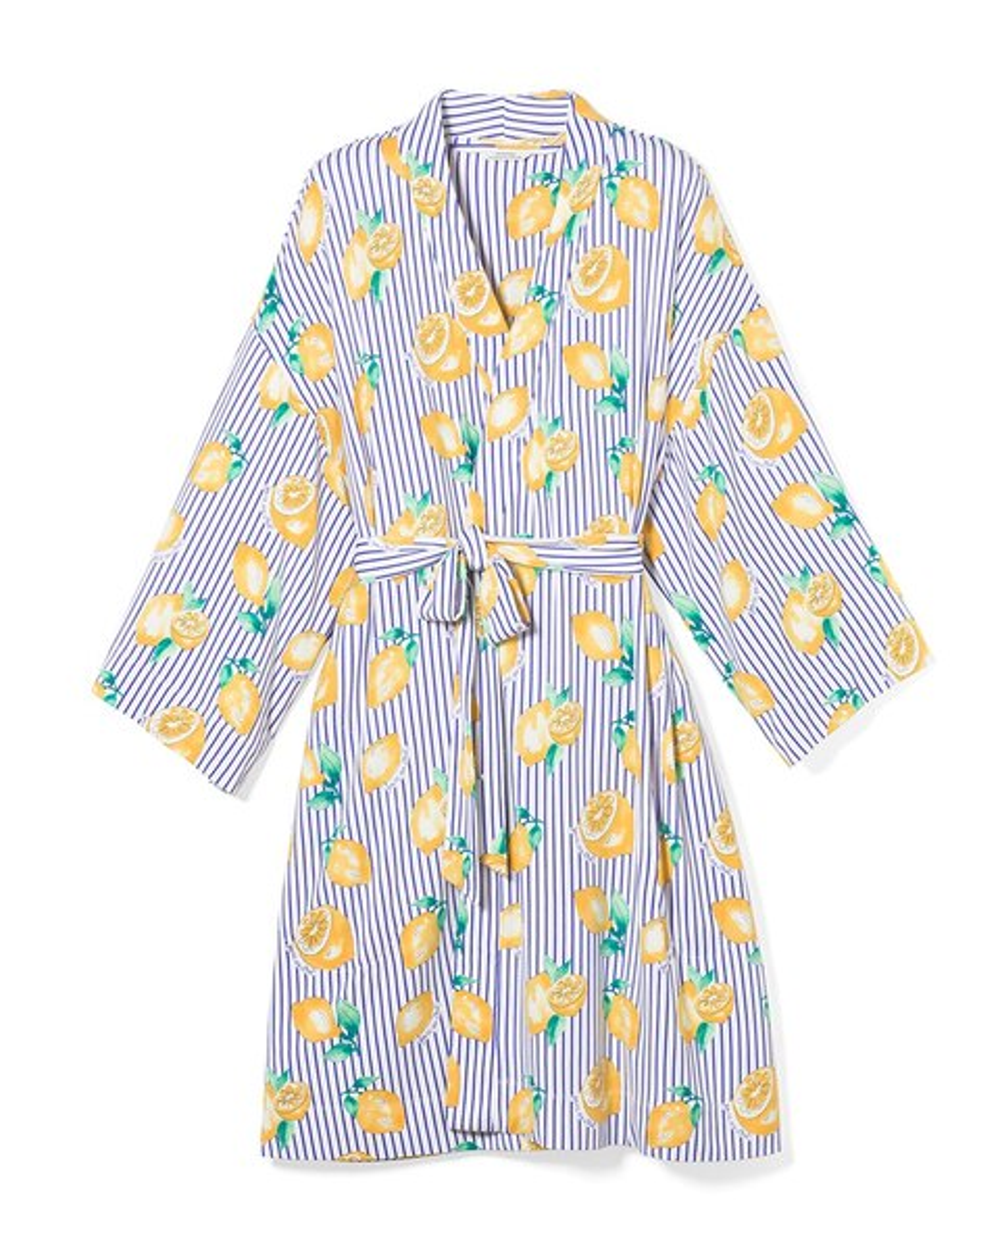 6f888bc84 Return to thumbnail image selection Kimono Sleeve Short Robe Lemon Zest